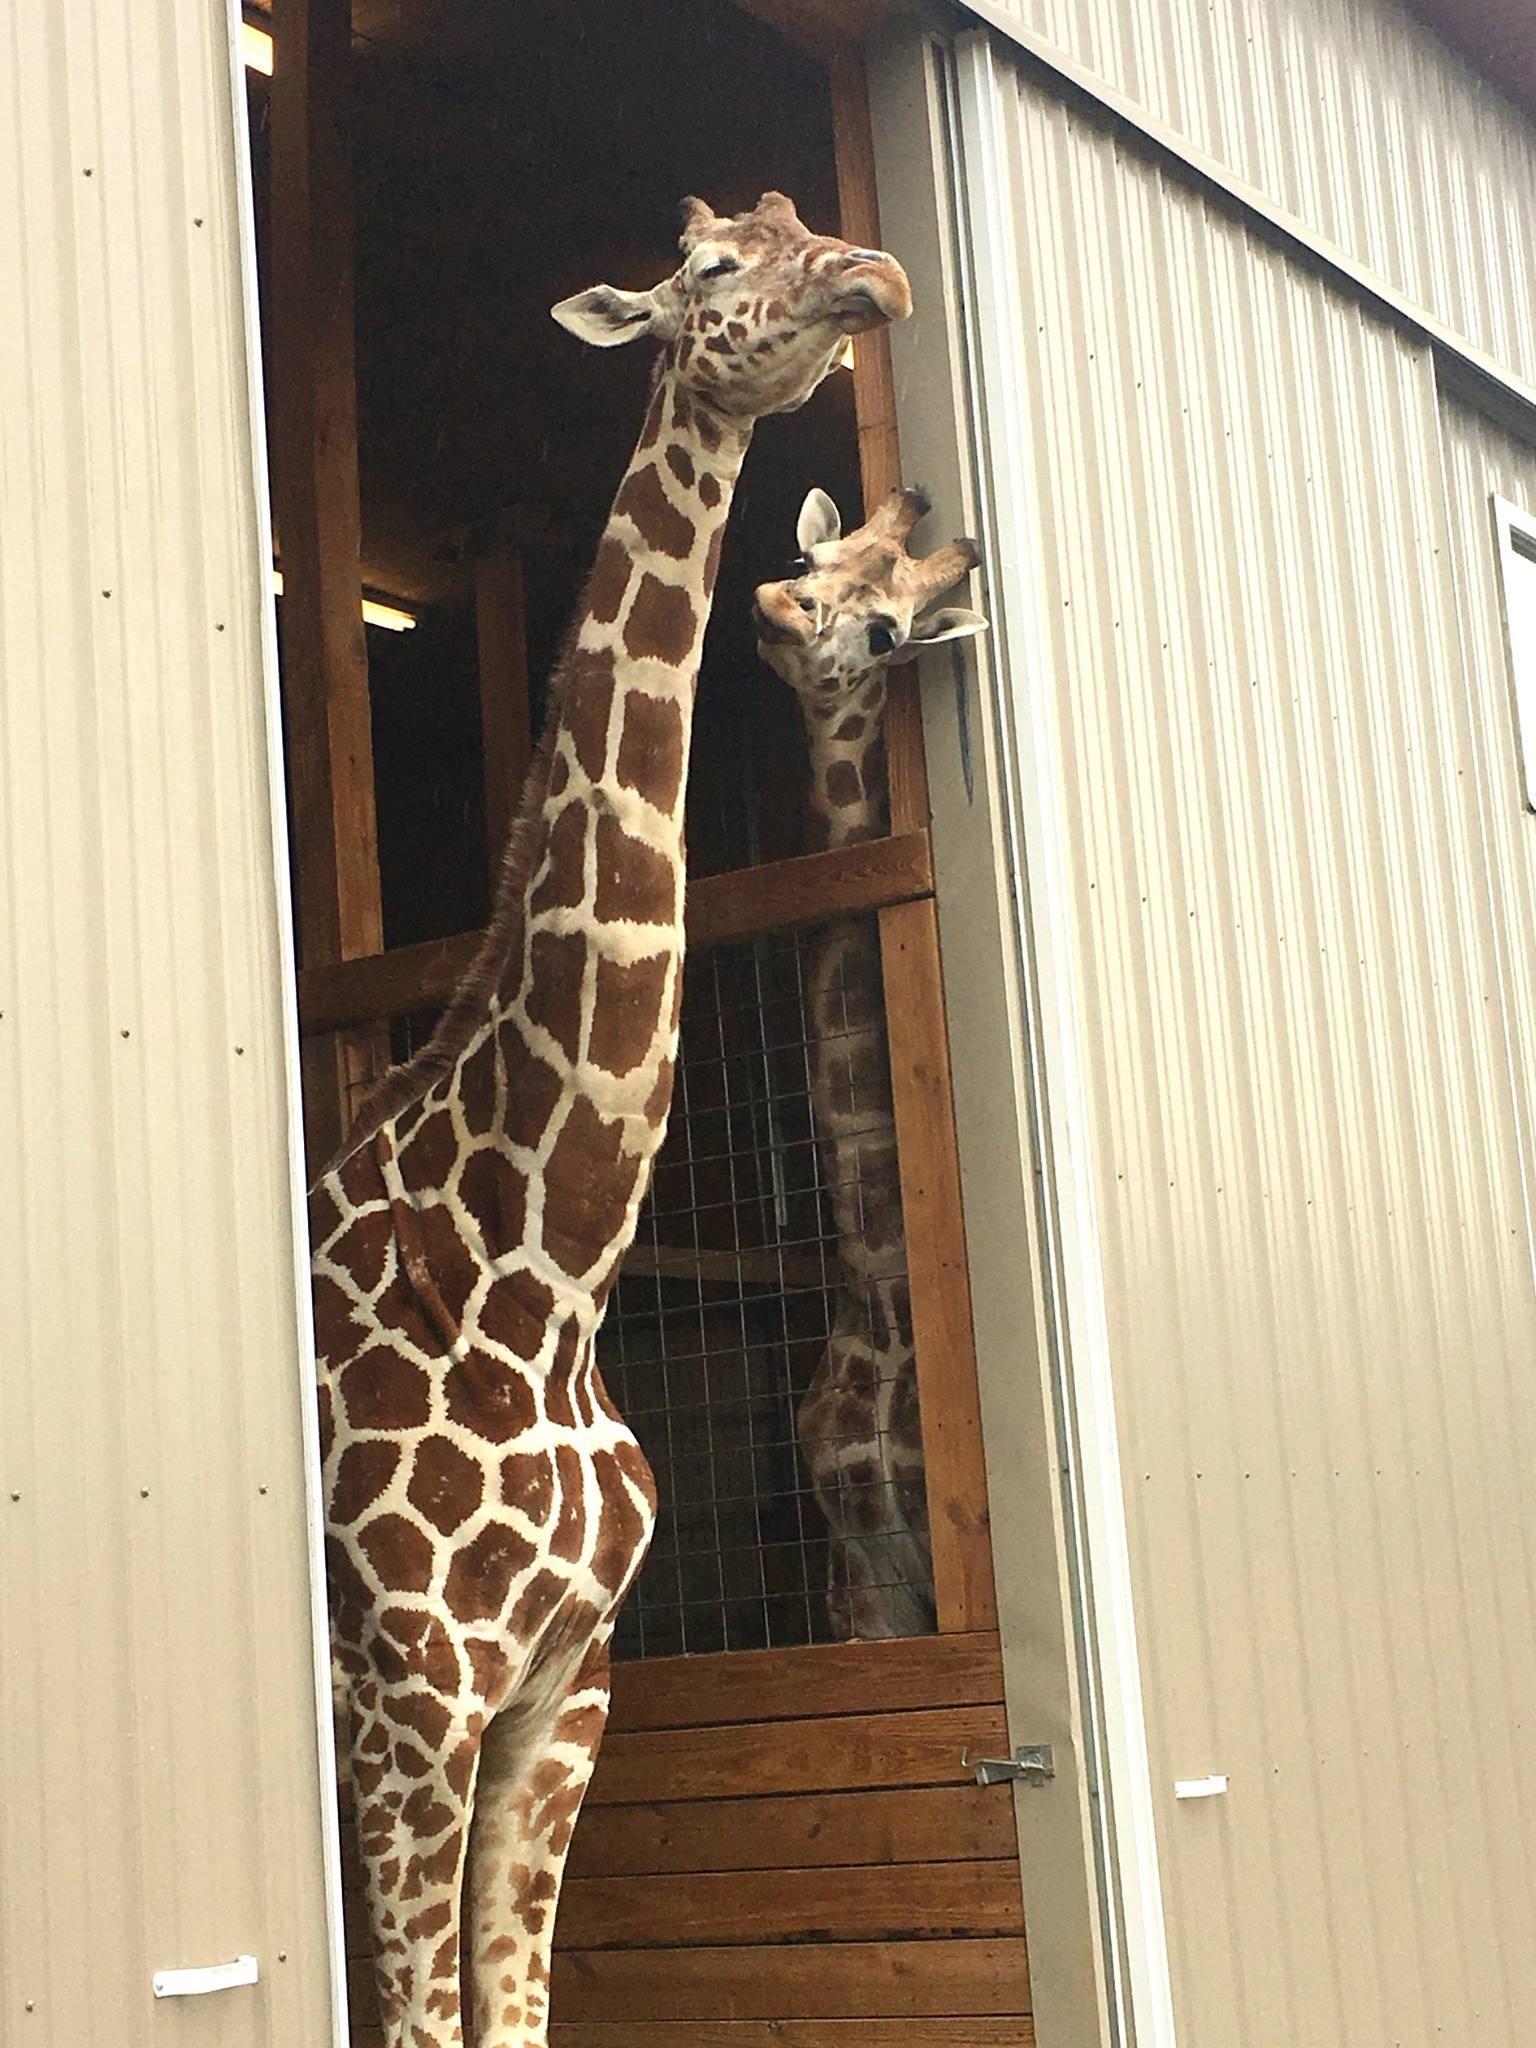 April the Giraffe at Animal Adventure